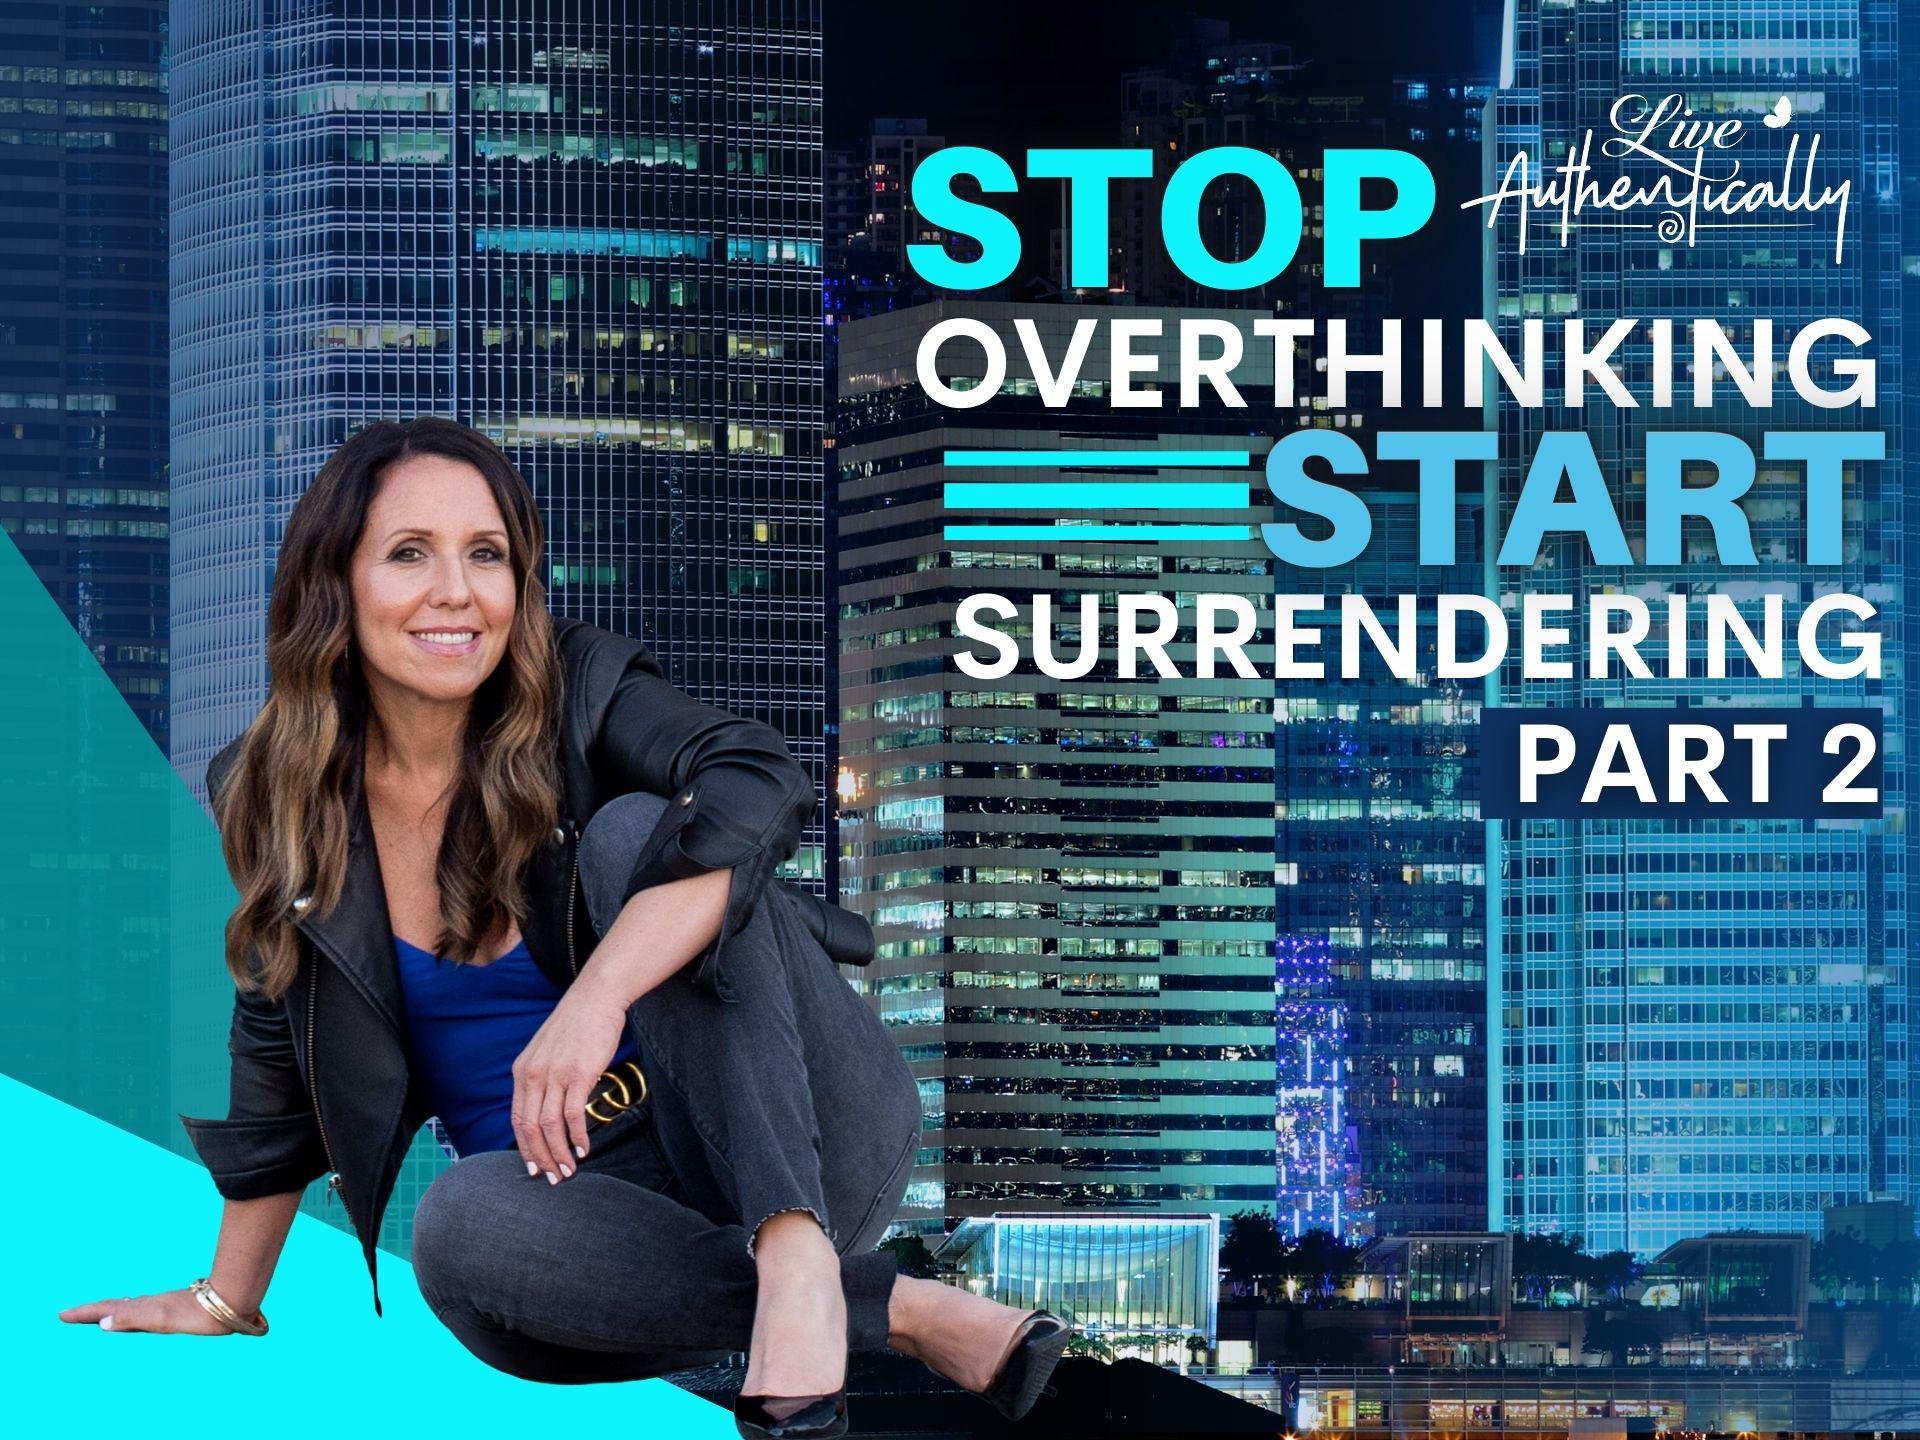 Stop Overthinking, Start Surrendering - Part 2